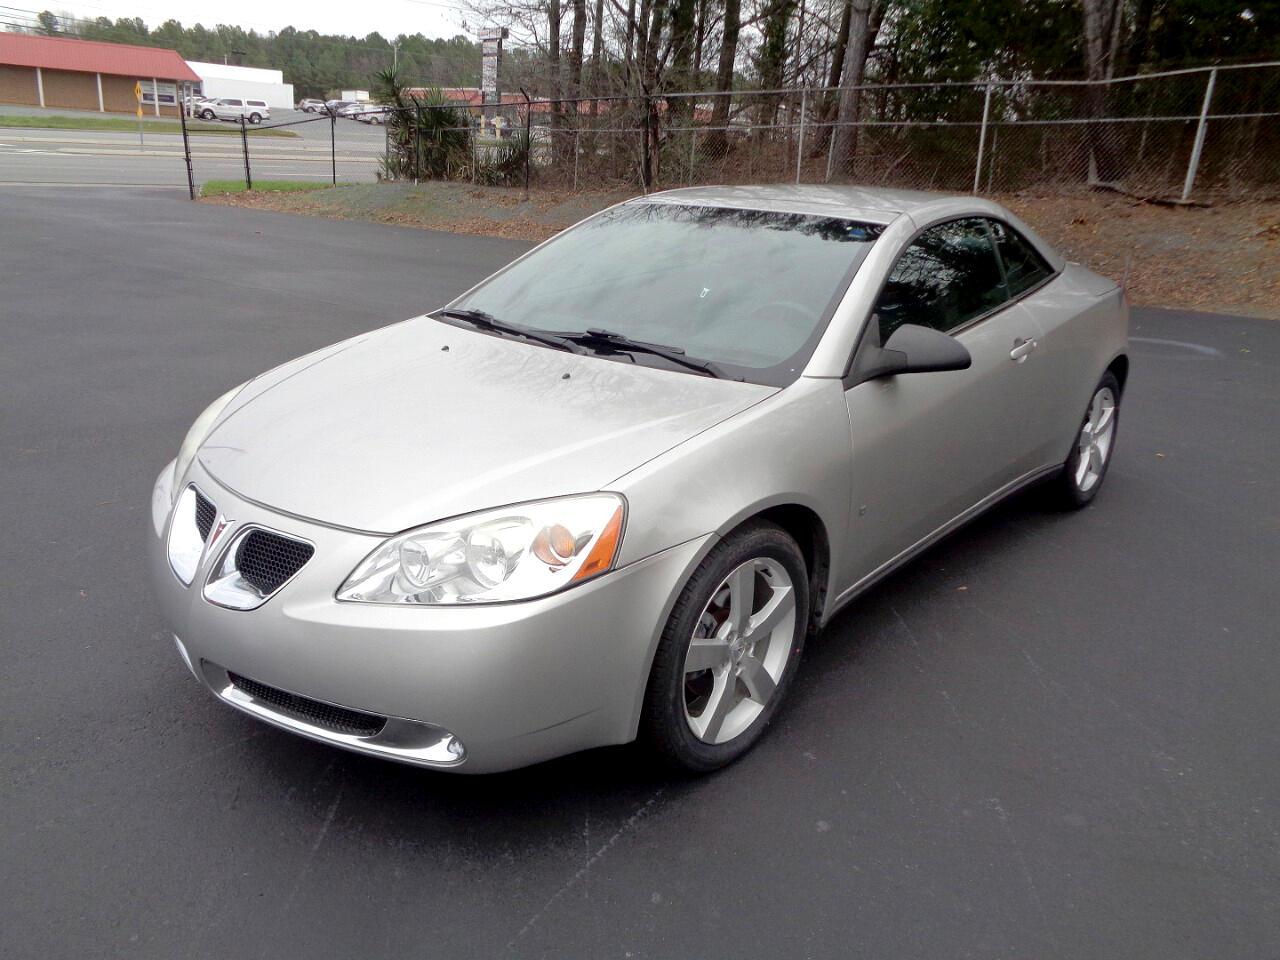 Used 2007 Pontiac G6 Gt Convertible For Sale In Monroe Nc 28110 Monroe Motor Company